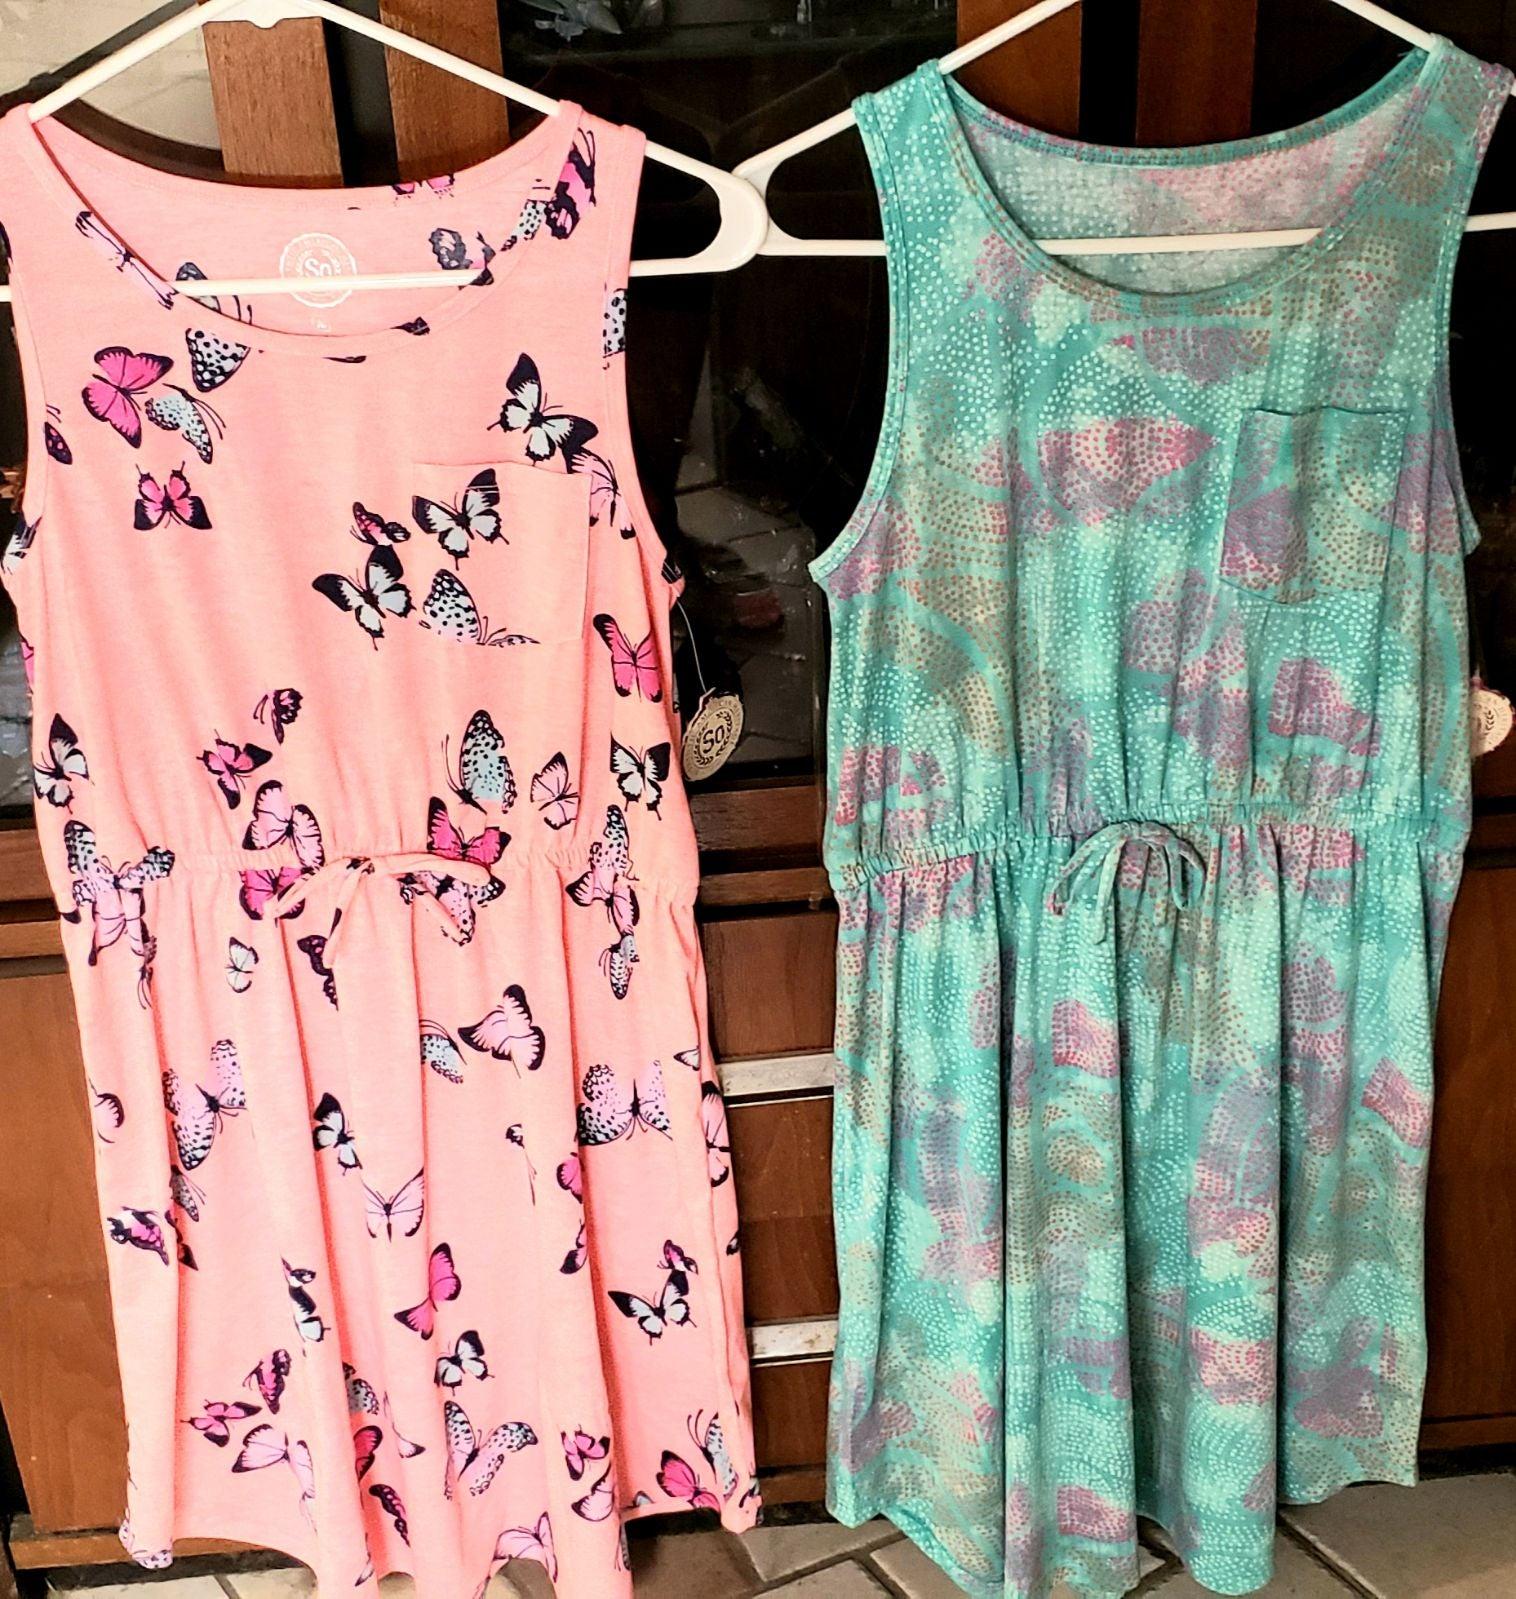 2 Girls Summer/Spring Dresses, Size 16 N